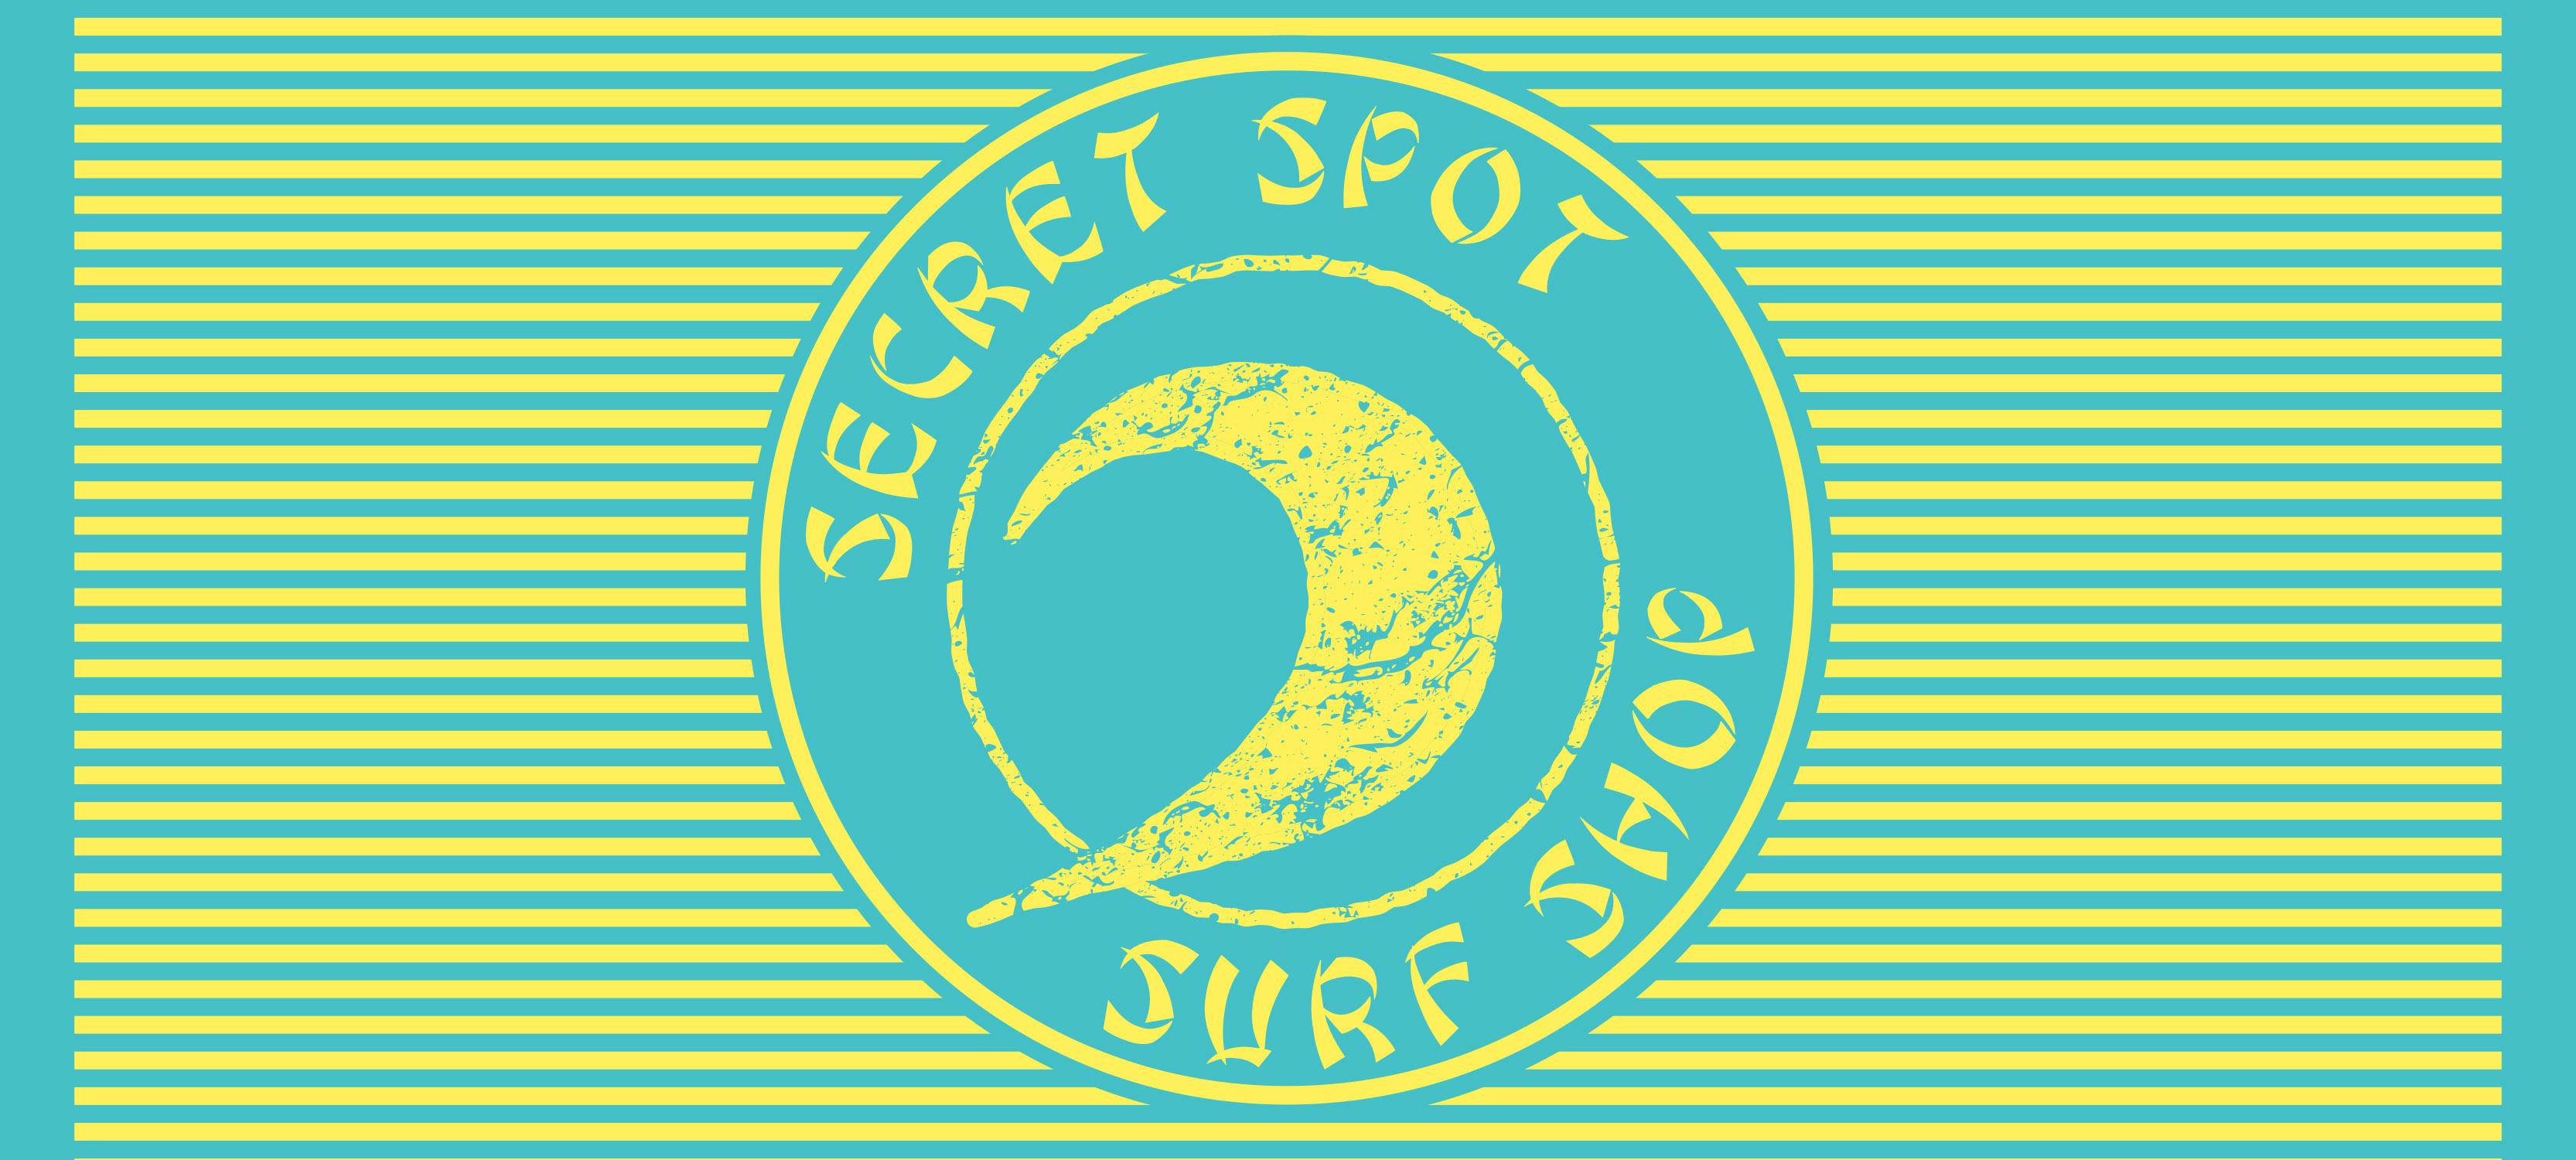 00210-SecretSpot-2016_30x70_V3-PROOF